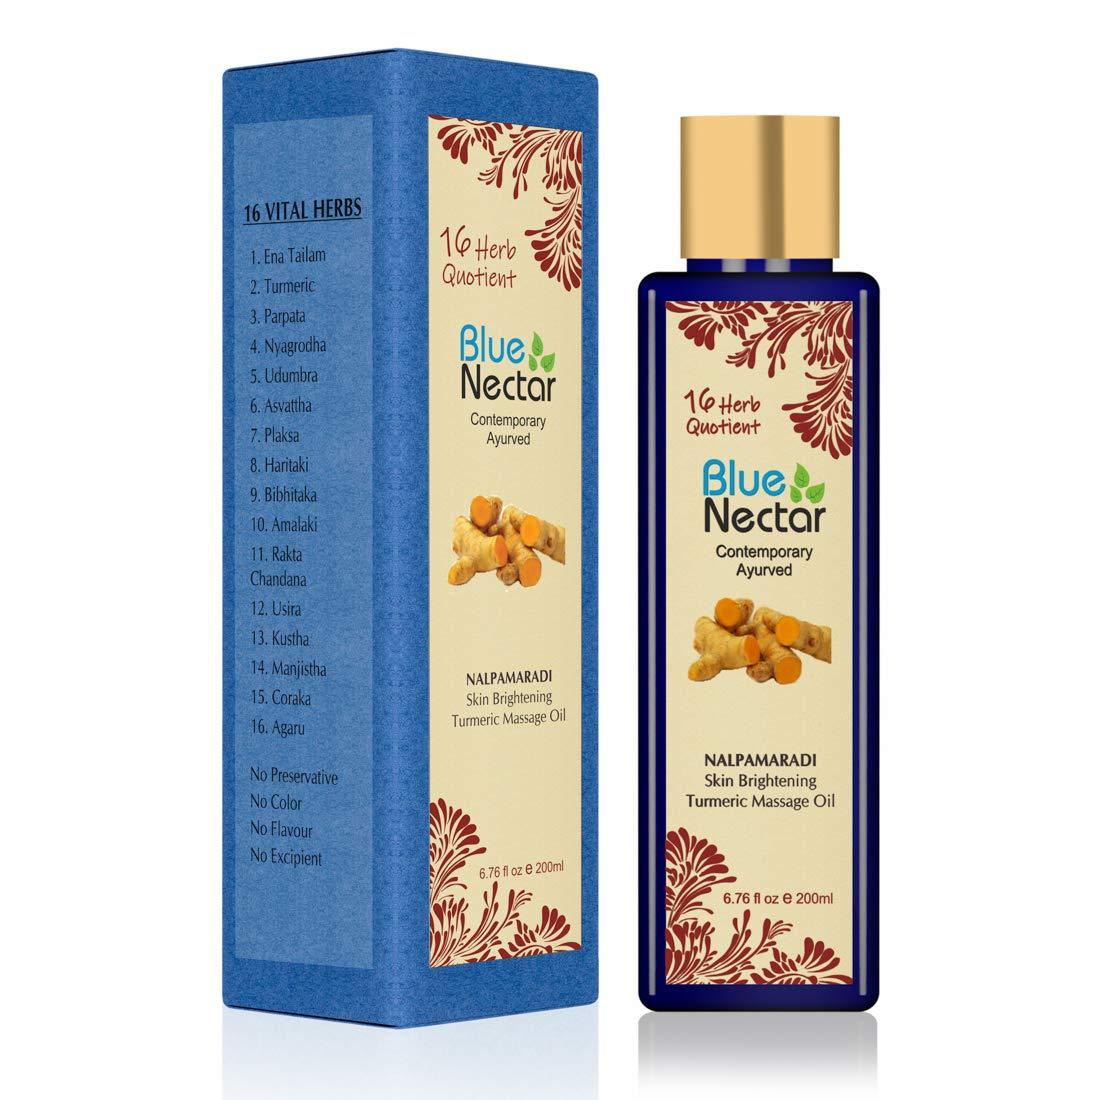 Blue Nectar Nalpamaradi Tailam Skin Brightening and Radiance Oil with Turmeric and 16 Ayurvedic Herbs